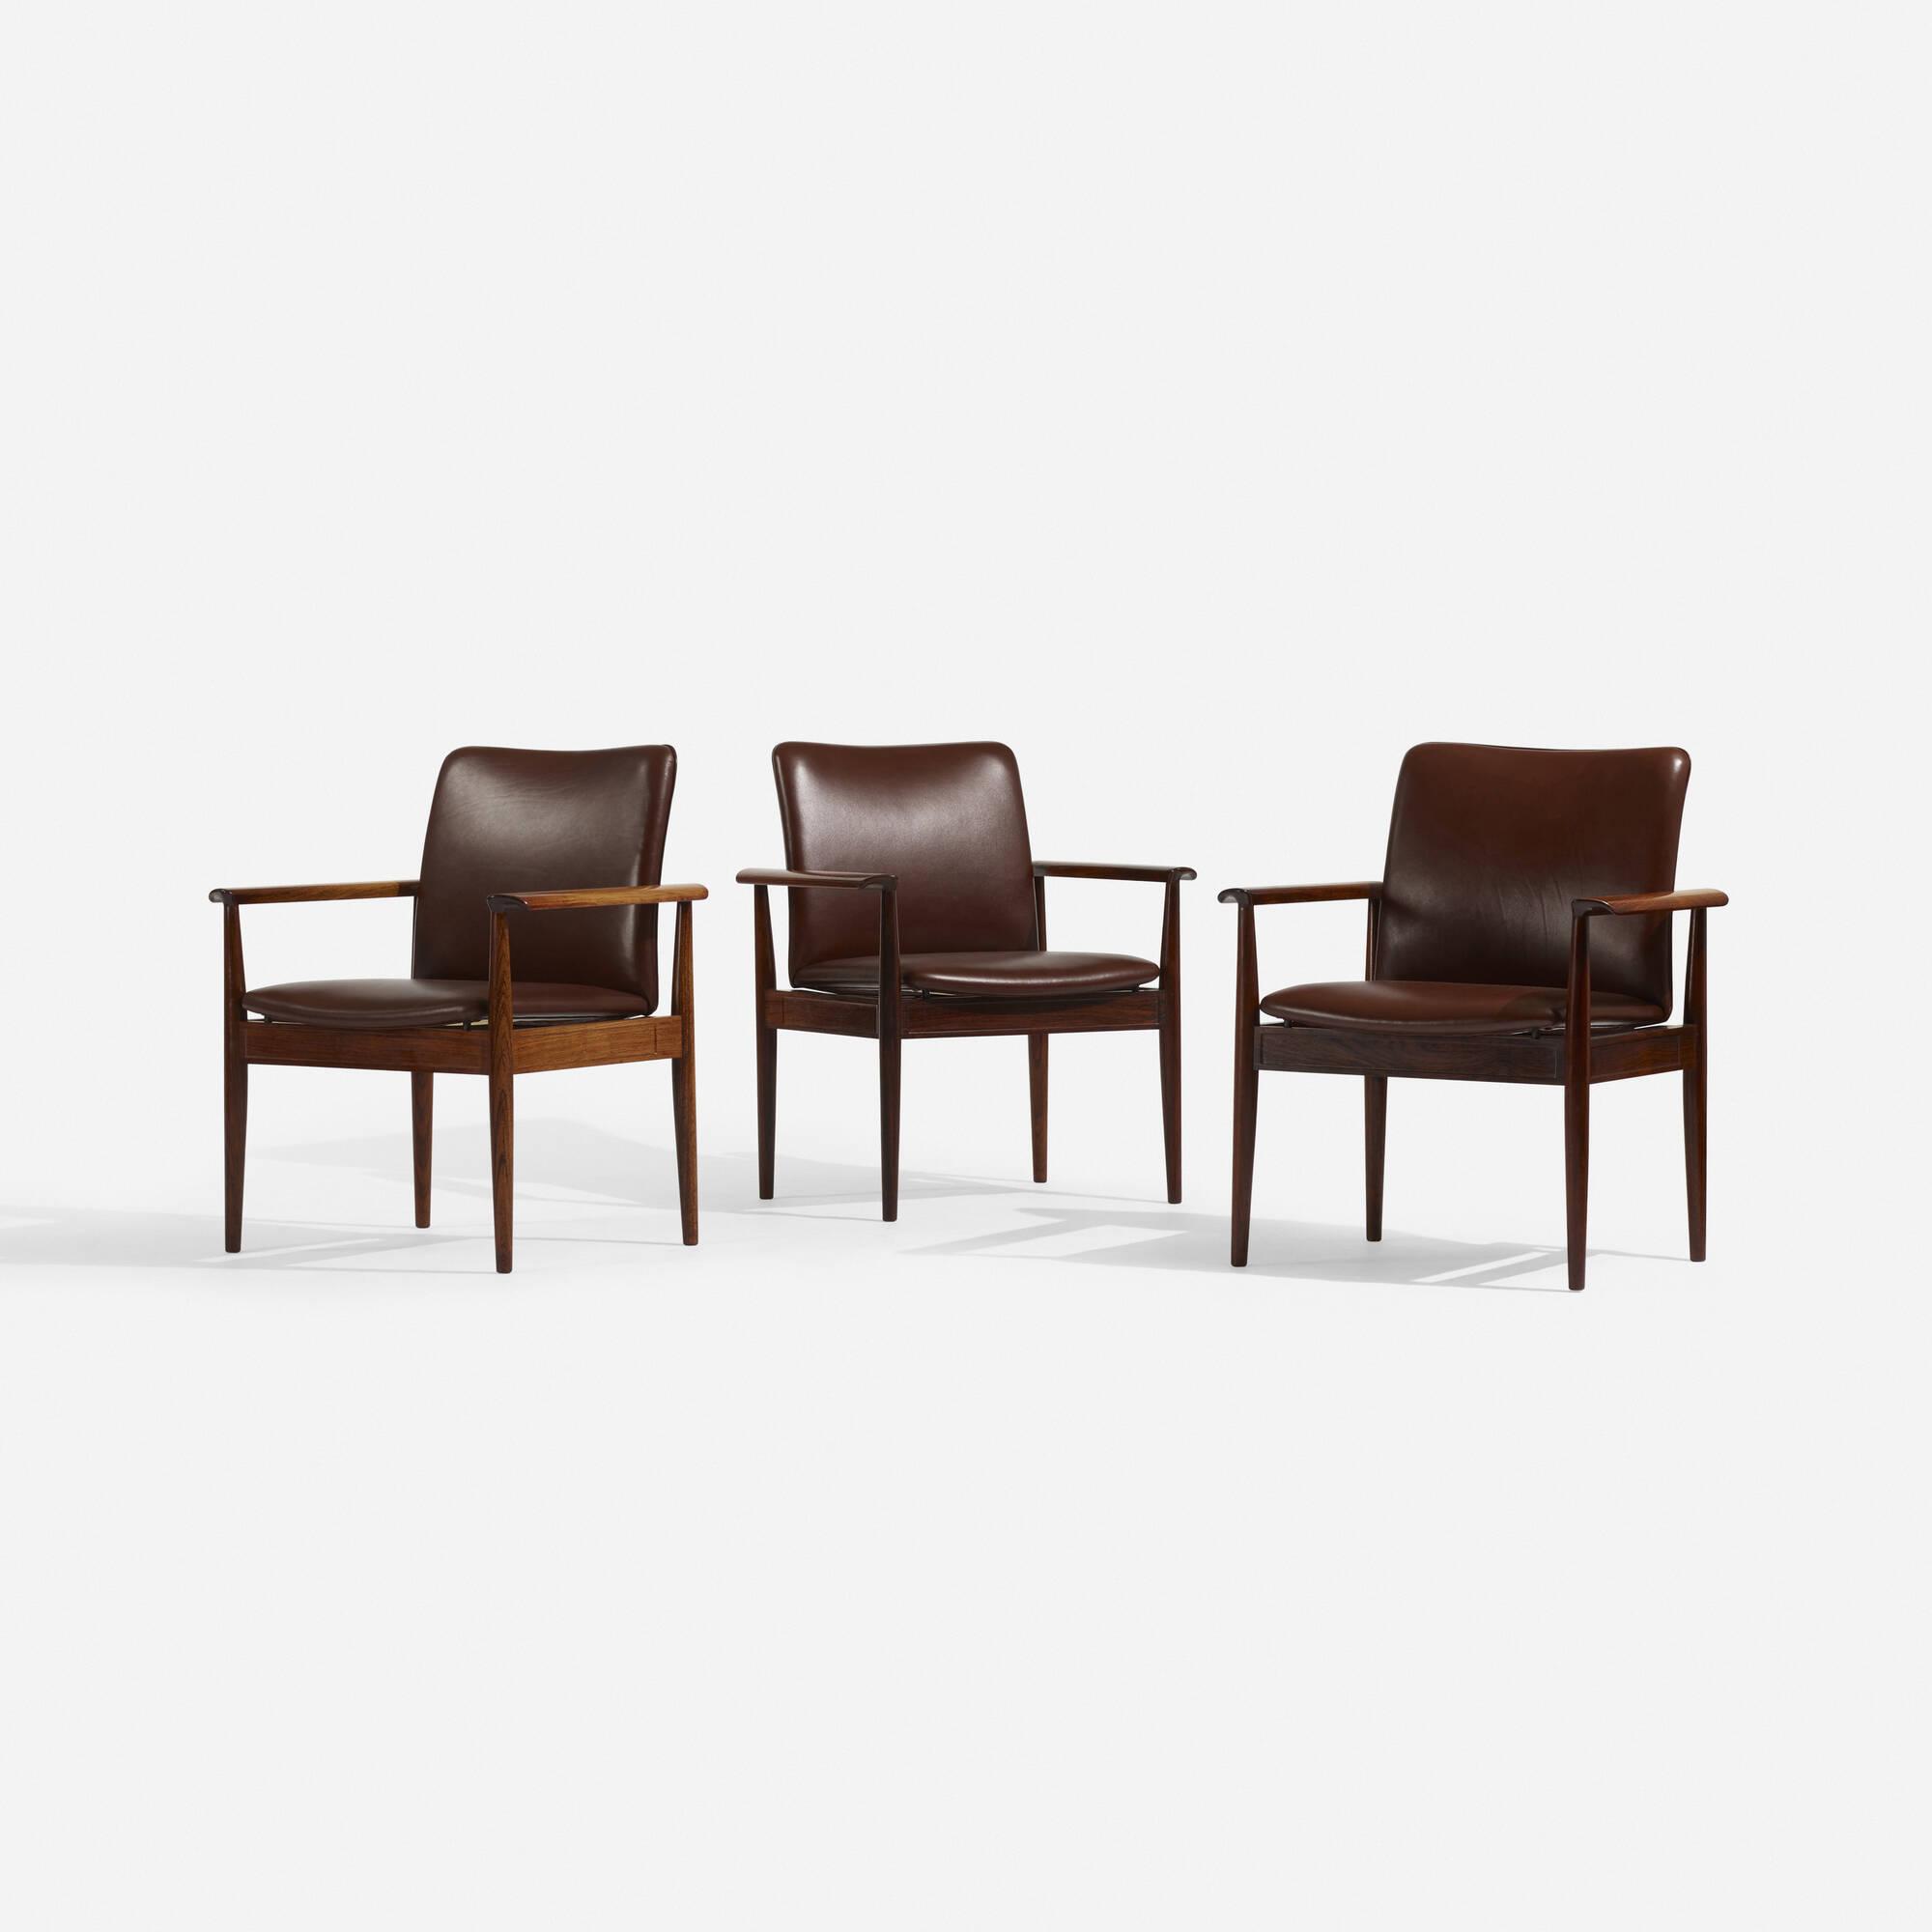 102: Finn Juhl / Diplomat armchairs, set of six (2 of 3)